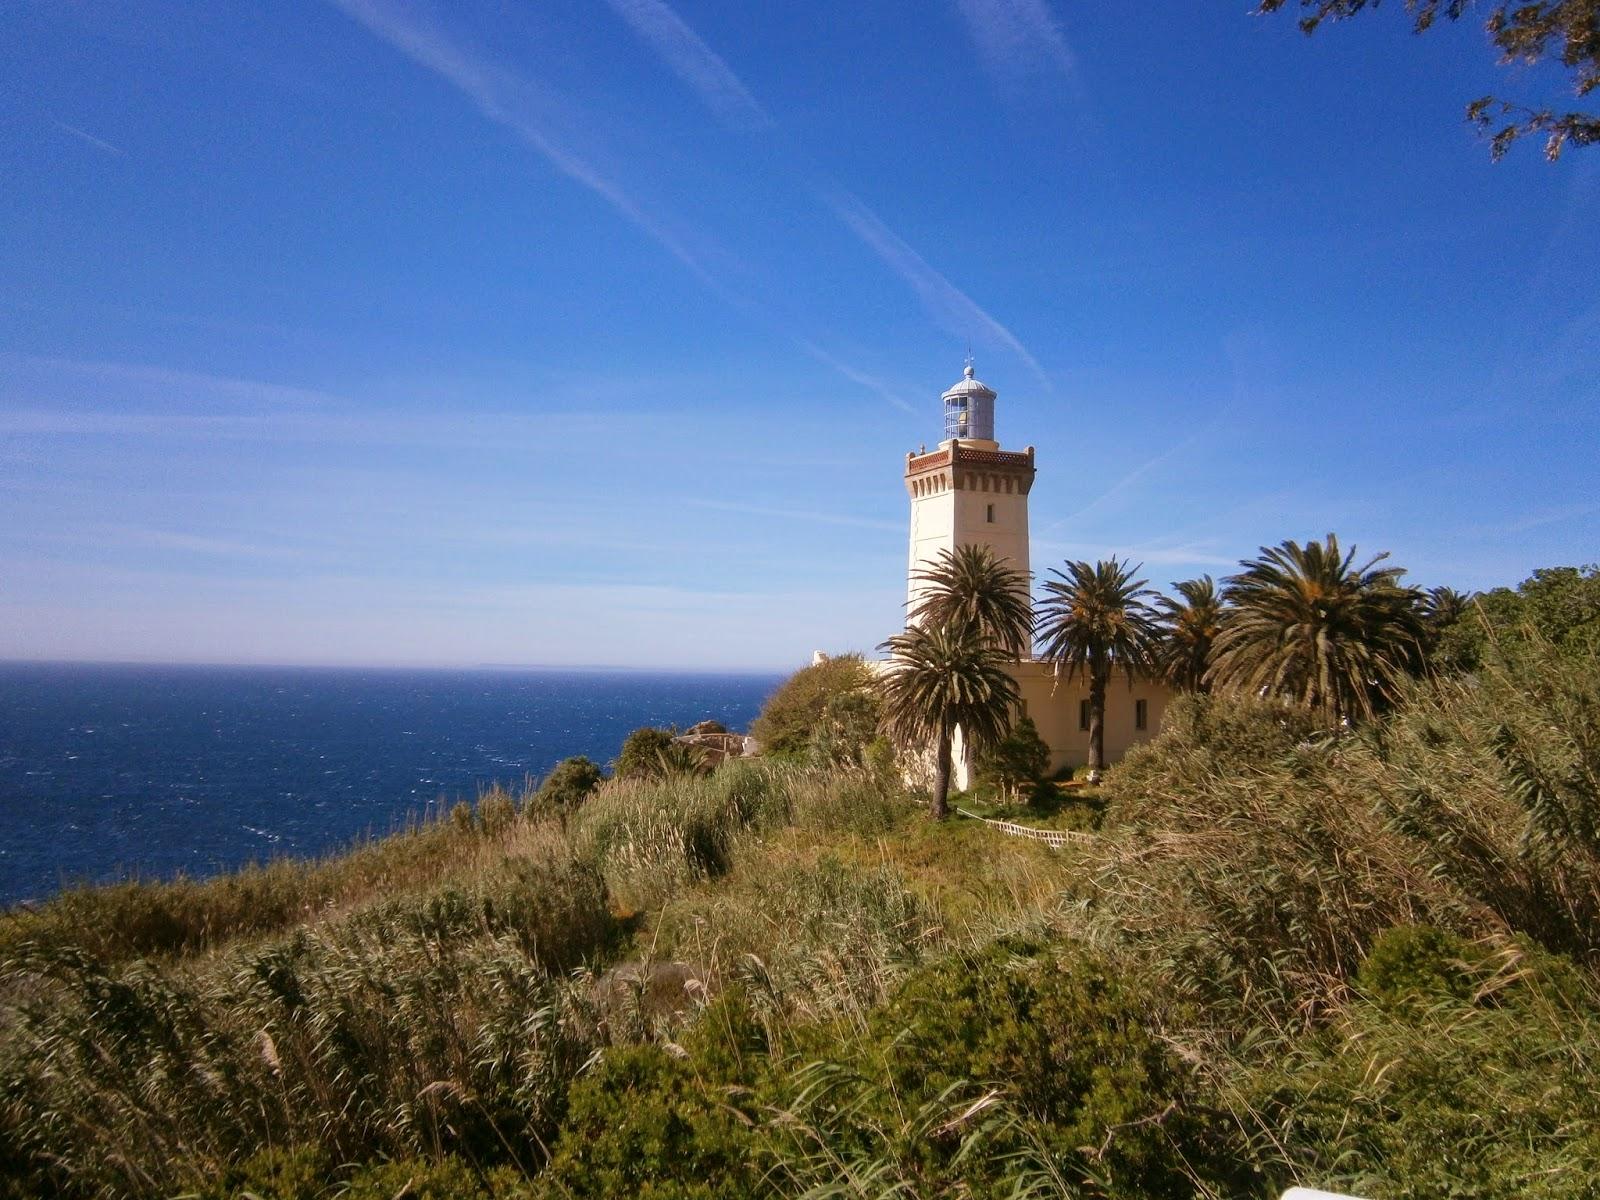 Vue panoramique Cap Spartel Tanger-Tetouan